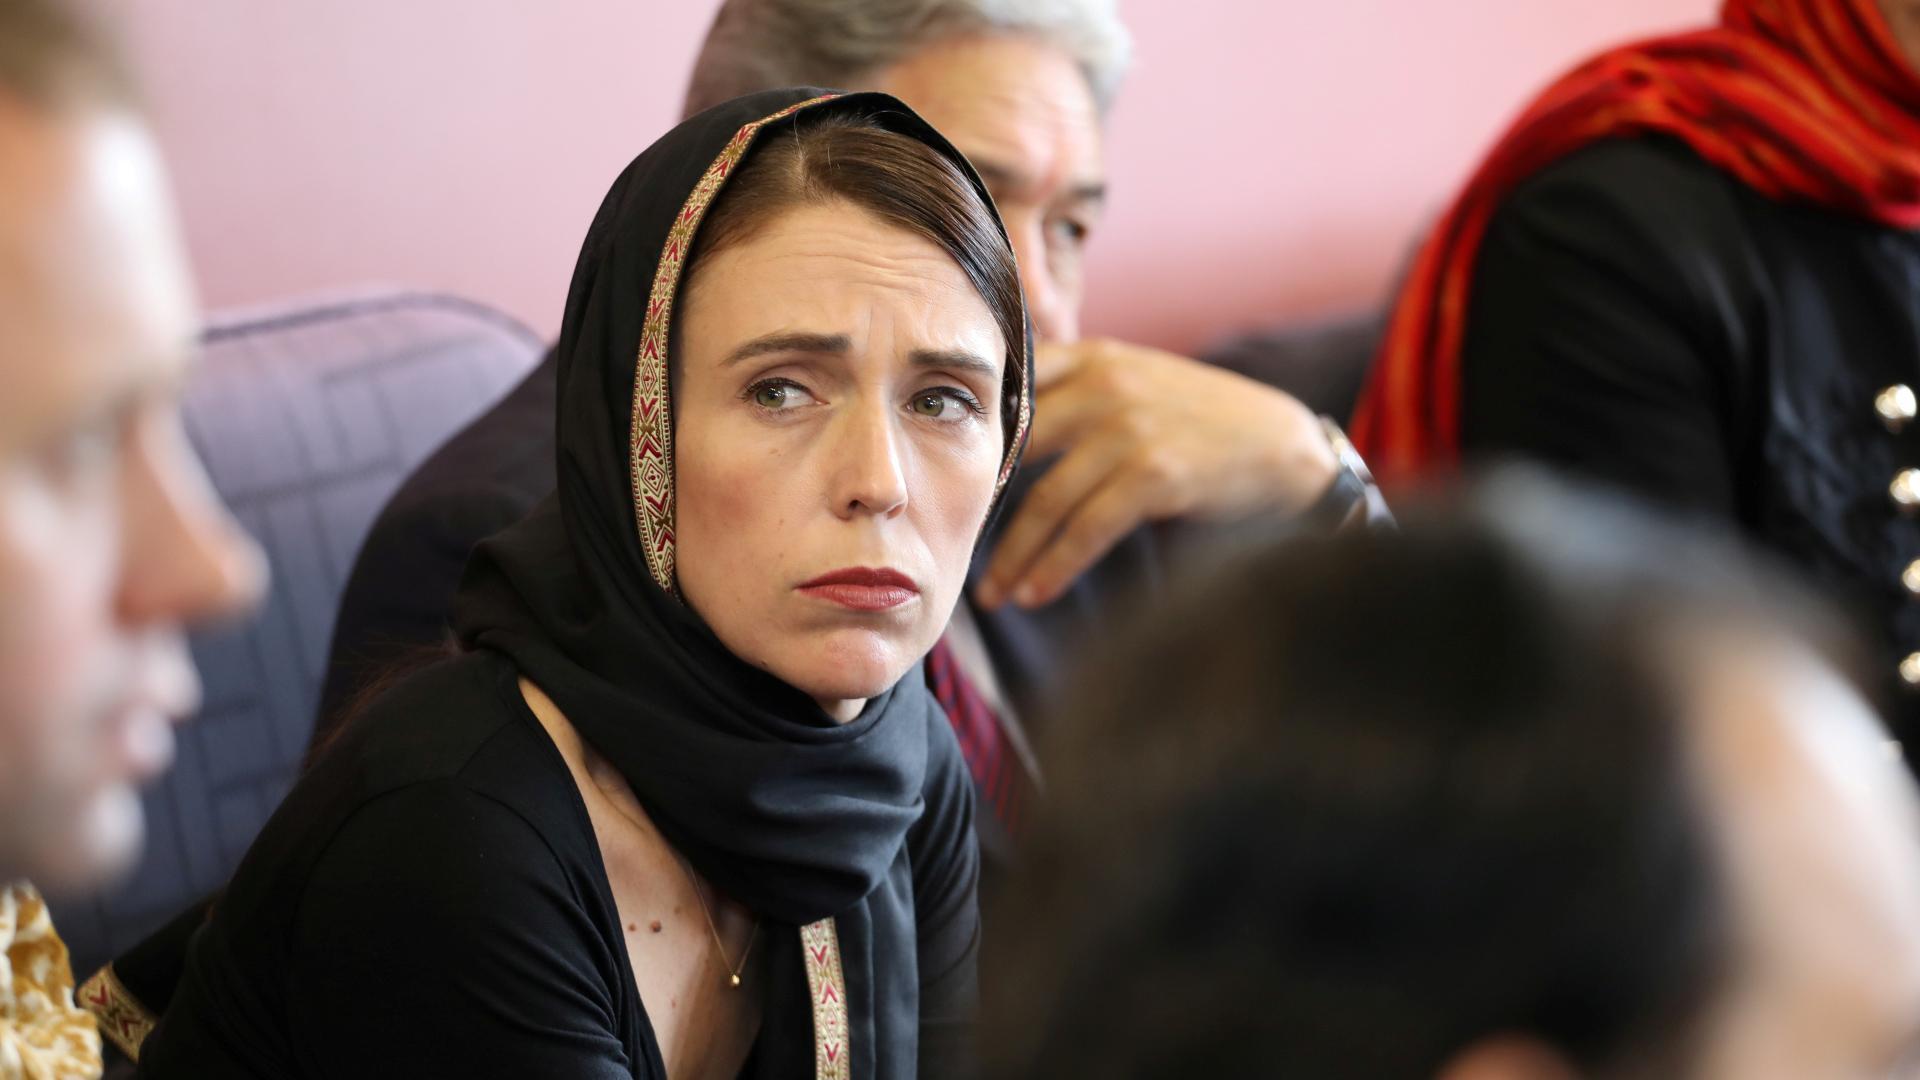 New York Times Editorial Board: U.S. Deserves Leader 'As Good As Jacinda Ardern'